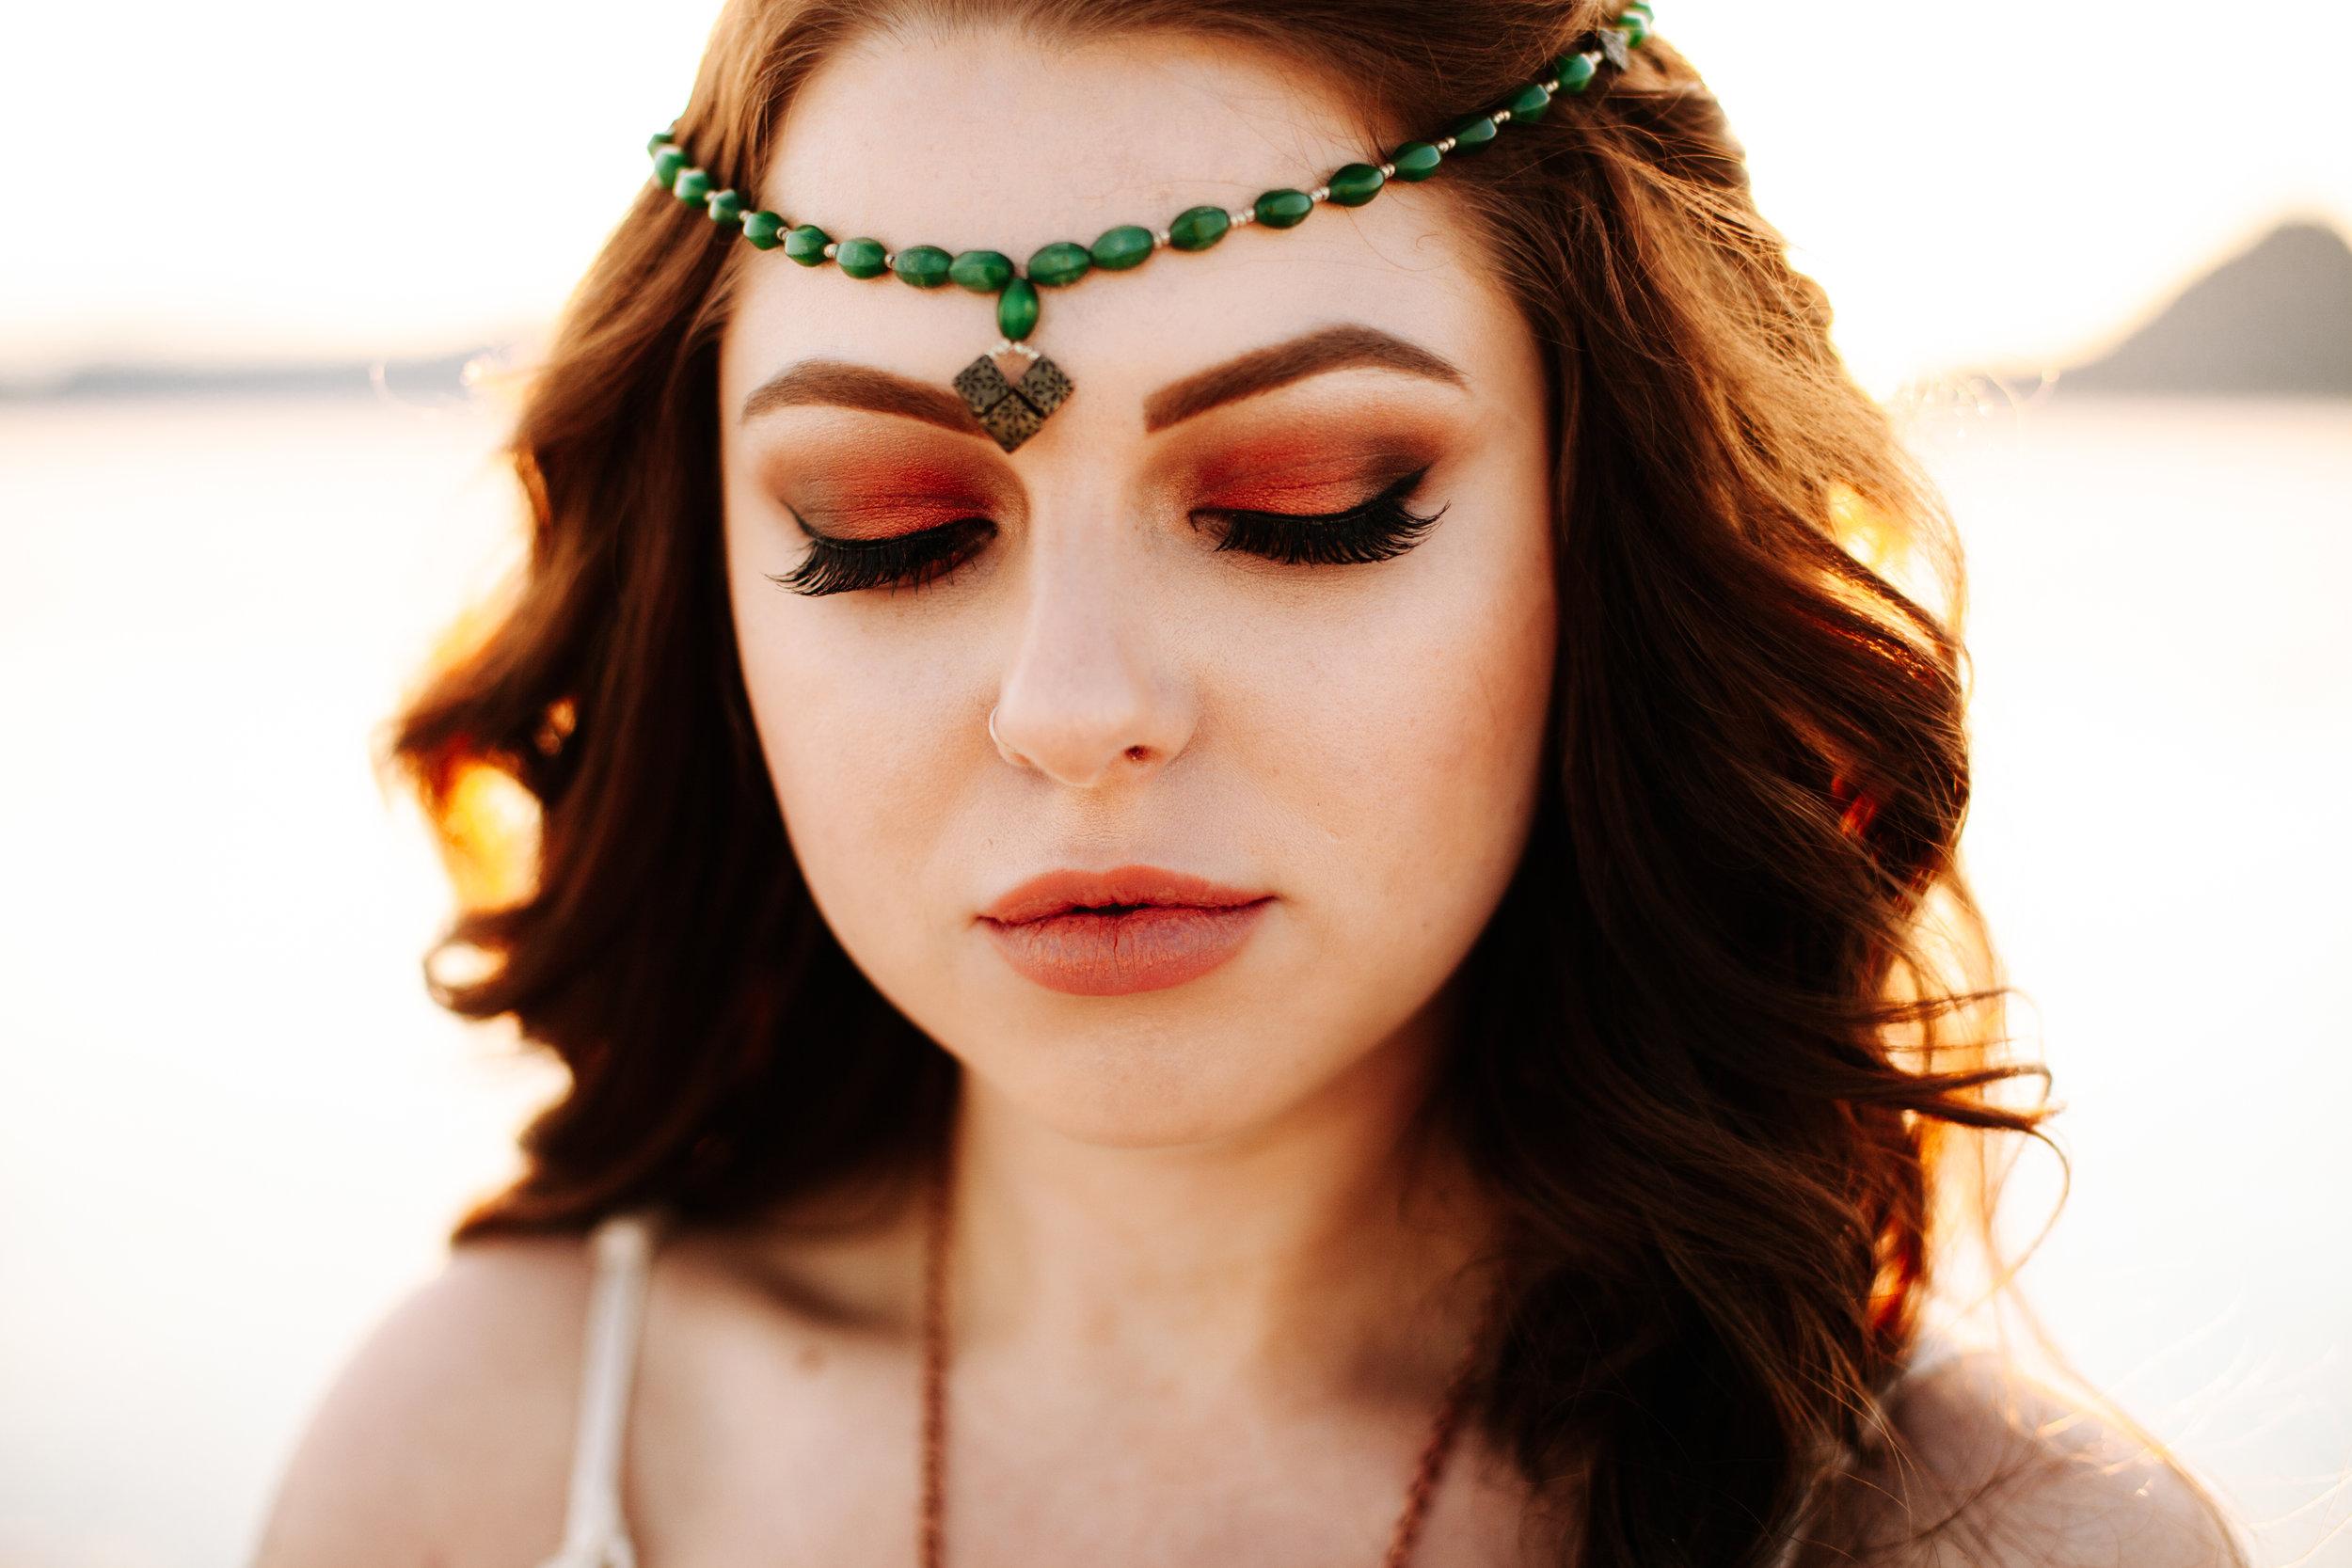 Salt Flats Wedding Photography - SLC Makeup Artist, Janelle Ingram